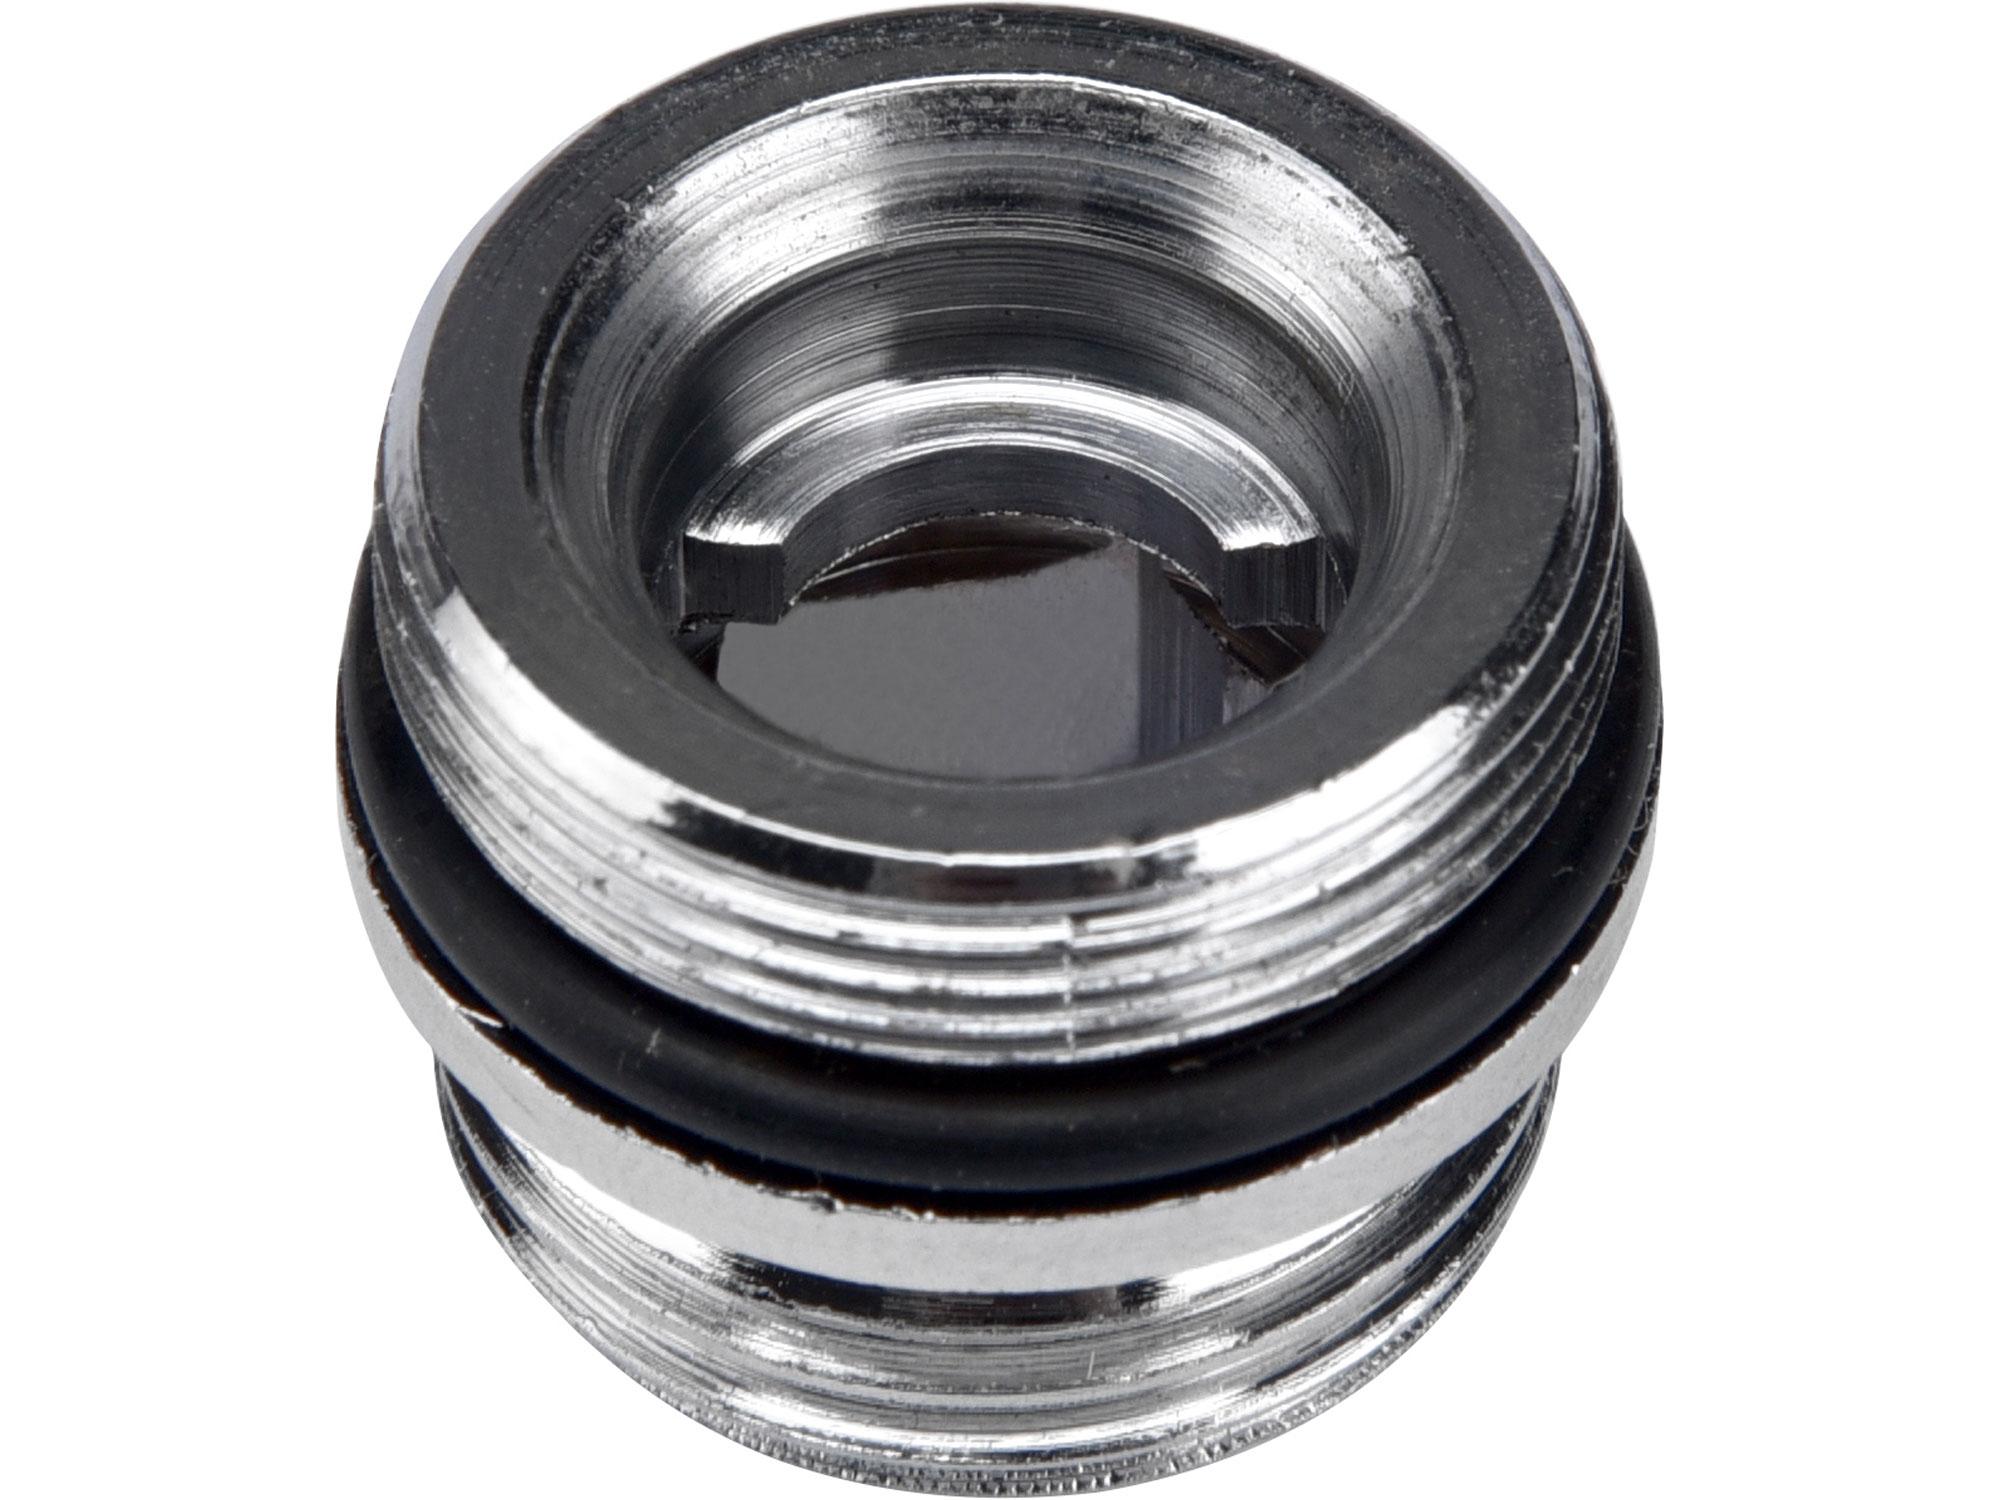 konektor pro sprchovou hadici, G1/2&quot -M20 81111